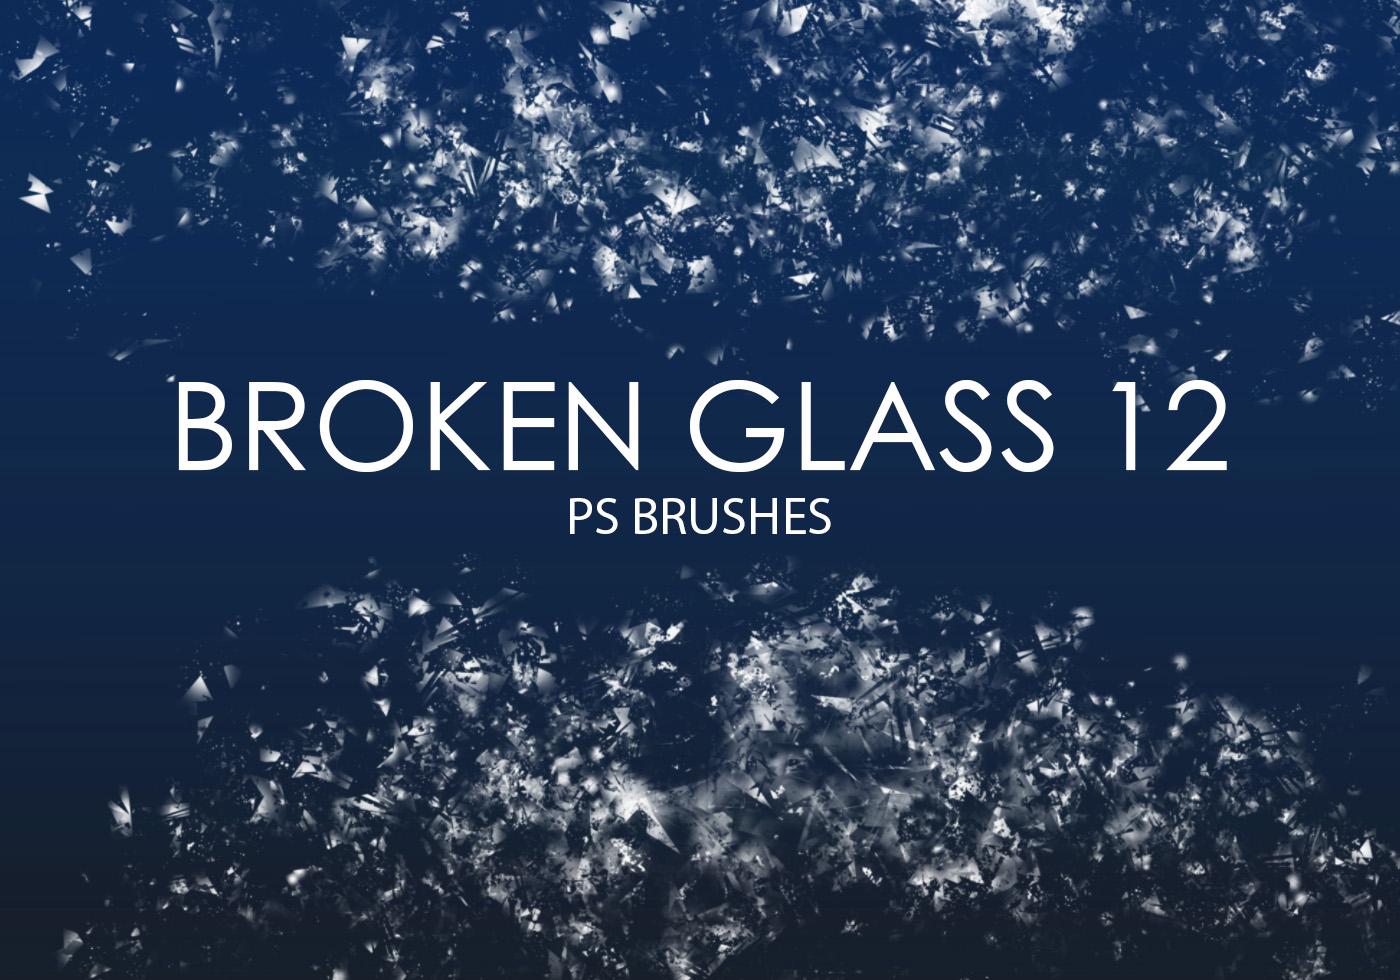 Broken Glass Pieces Brush Photoshop